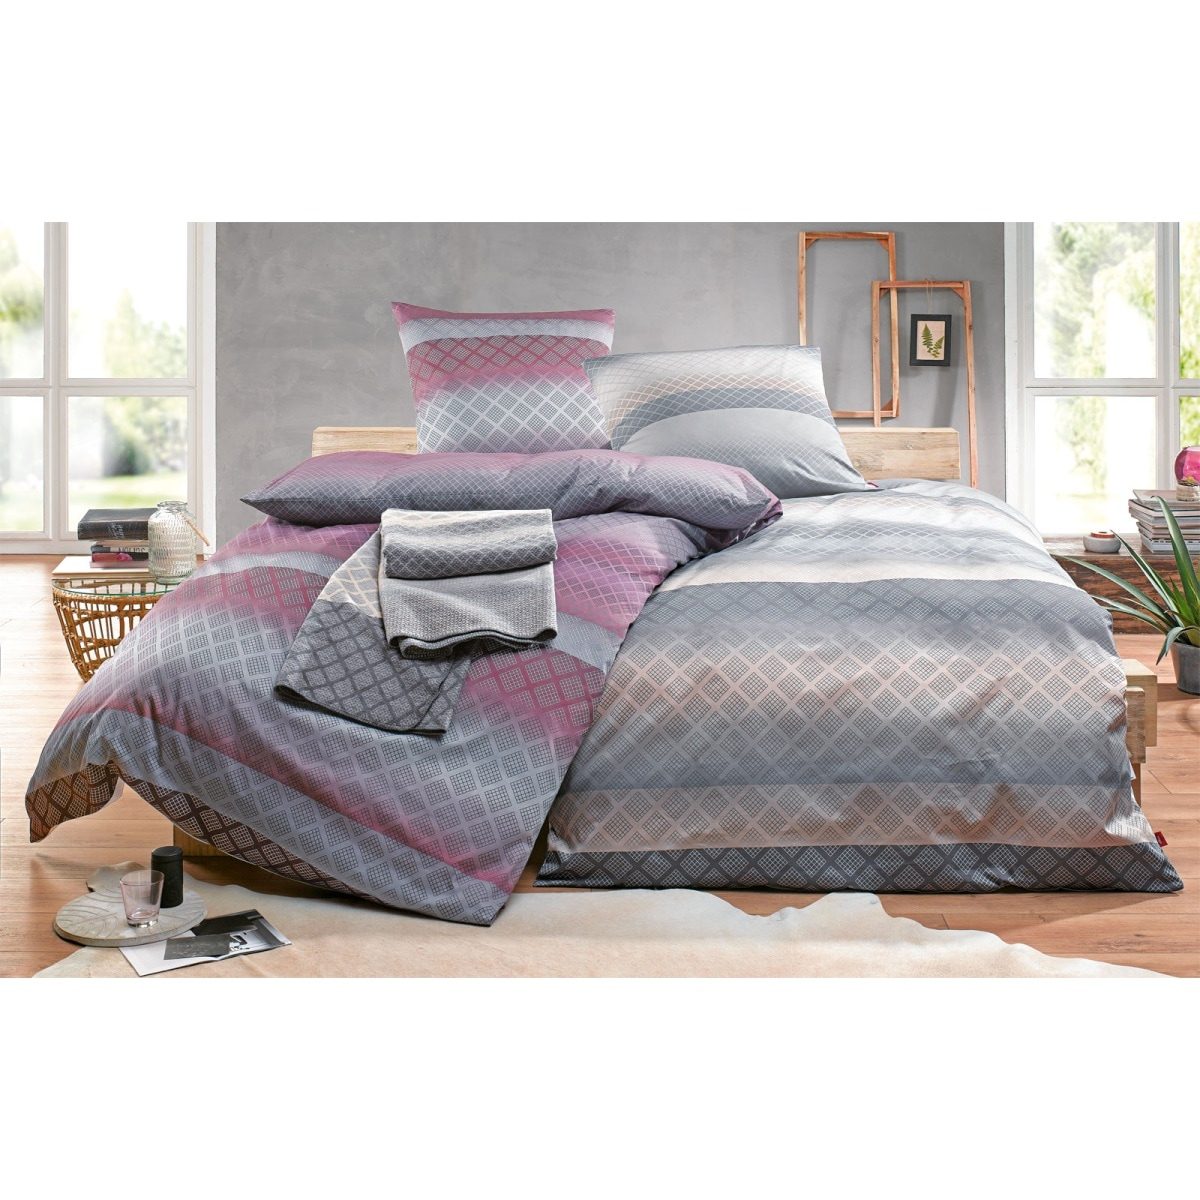 s oliver satin bettw sche 135 x 200 cm in lila grau. Black Bedroom Furniture Sets. Home Design Ideas